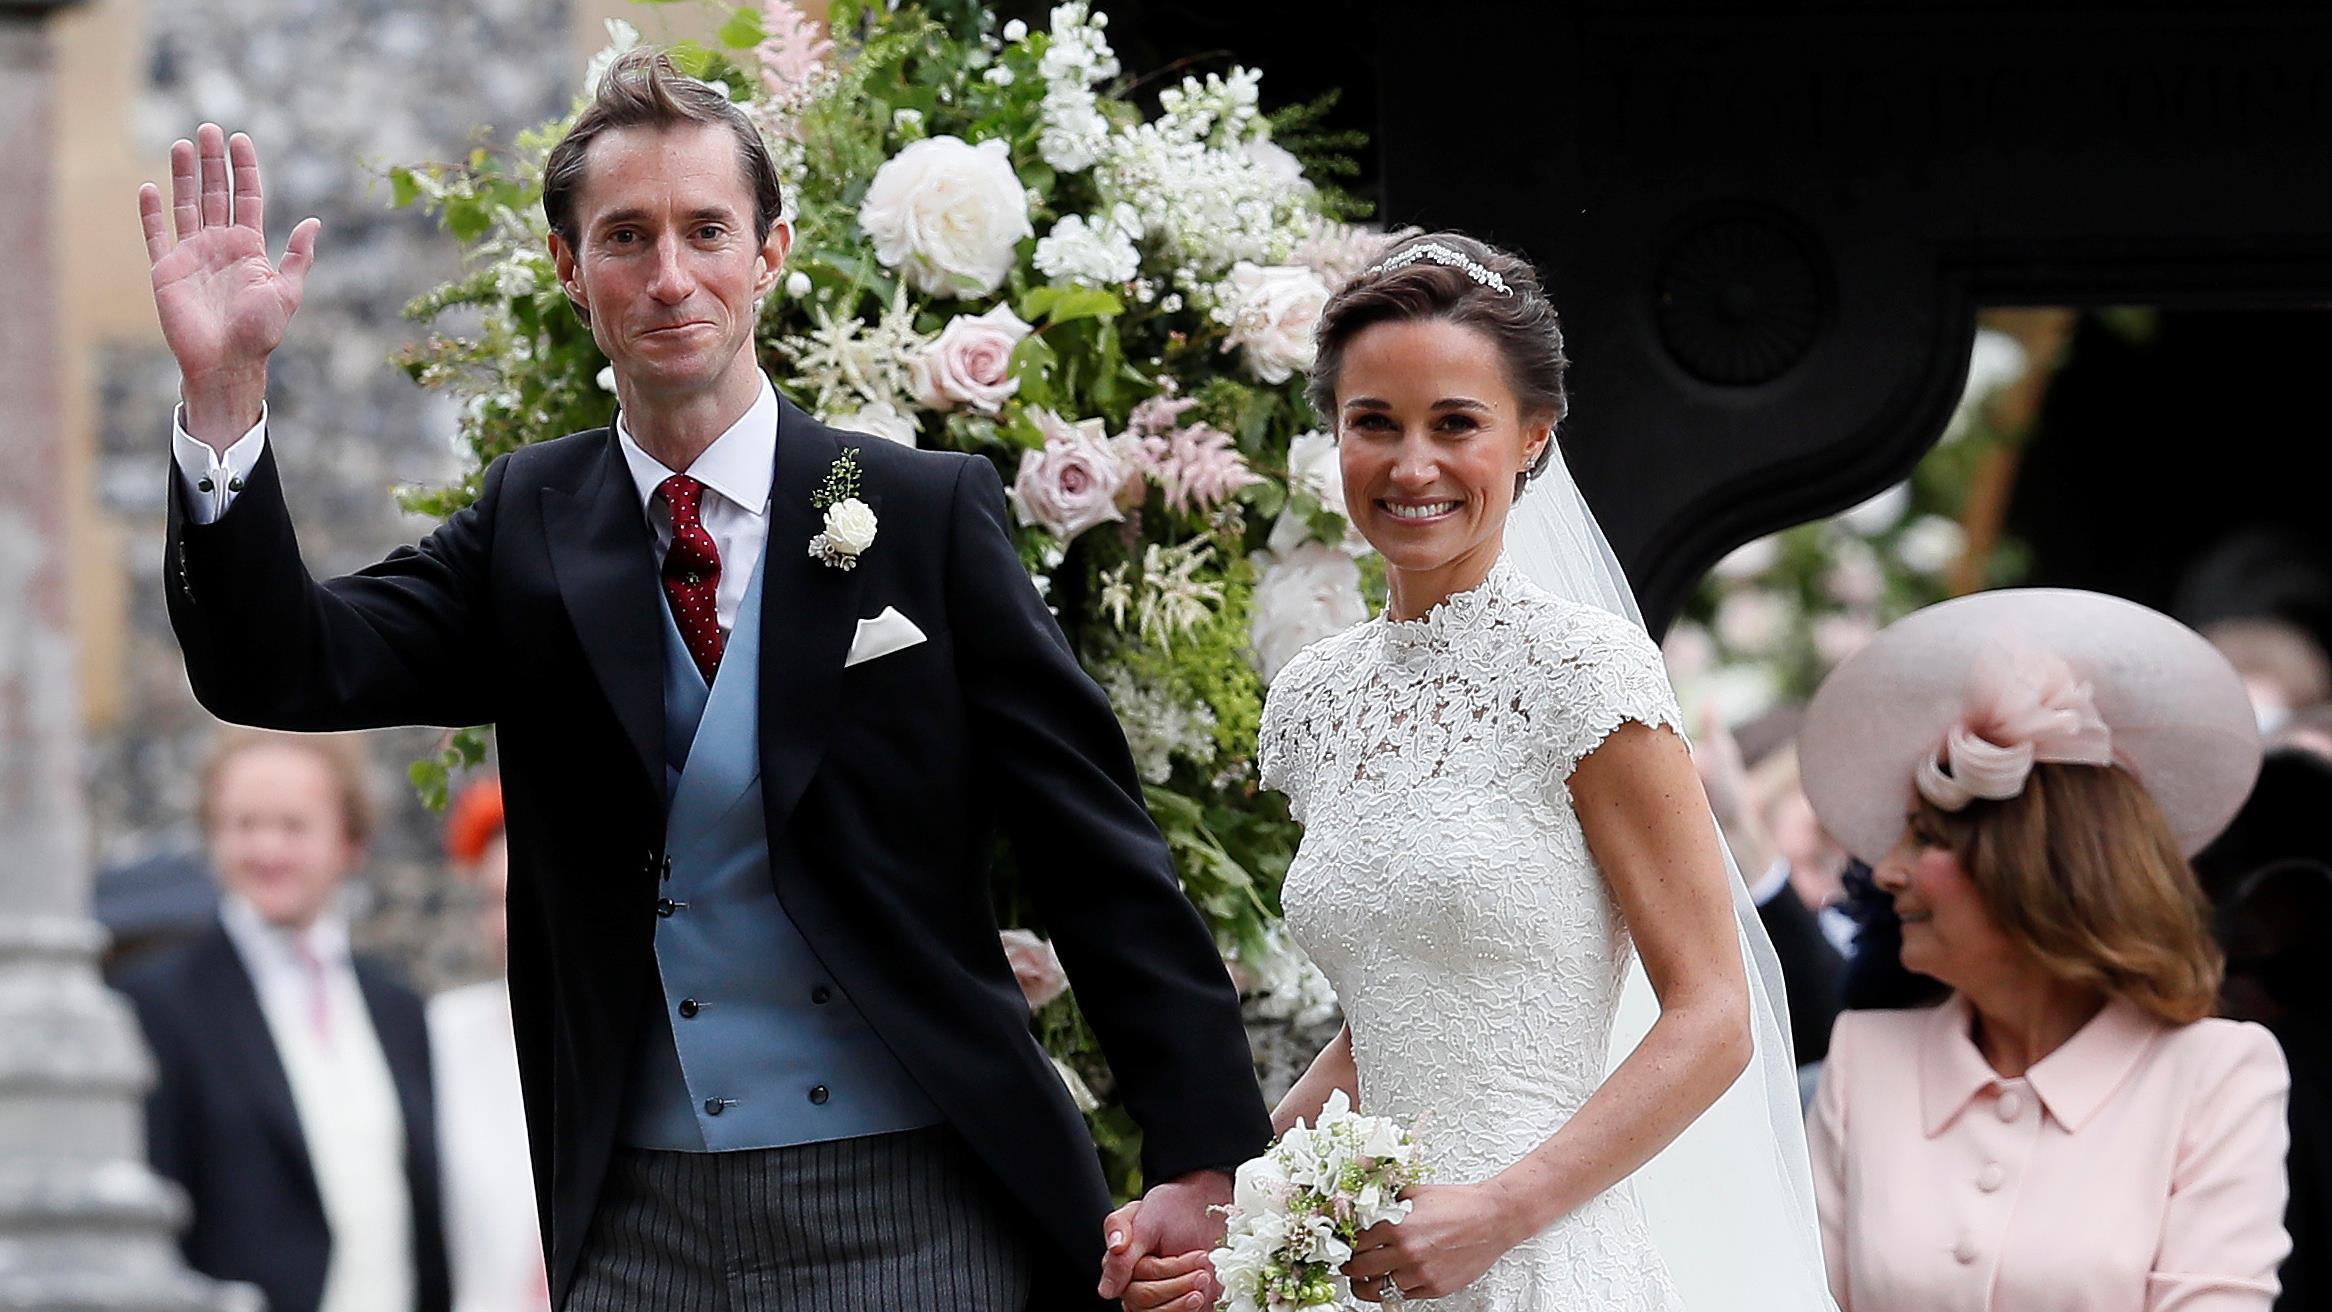 Connu La famille royale au mariage de Pippa Middleton | ICI.Radio-Canada.ca DZ97